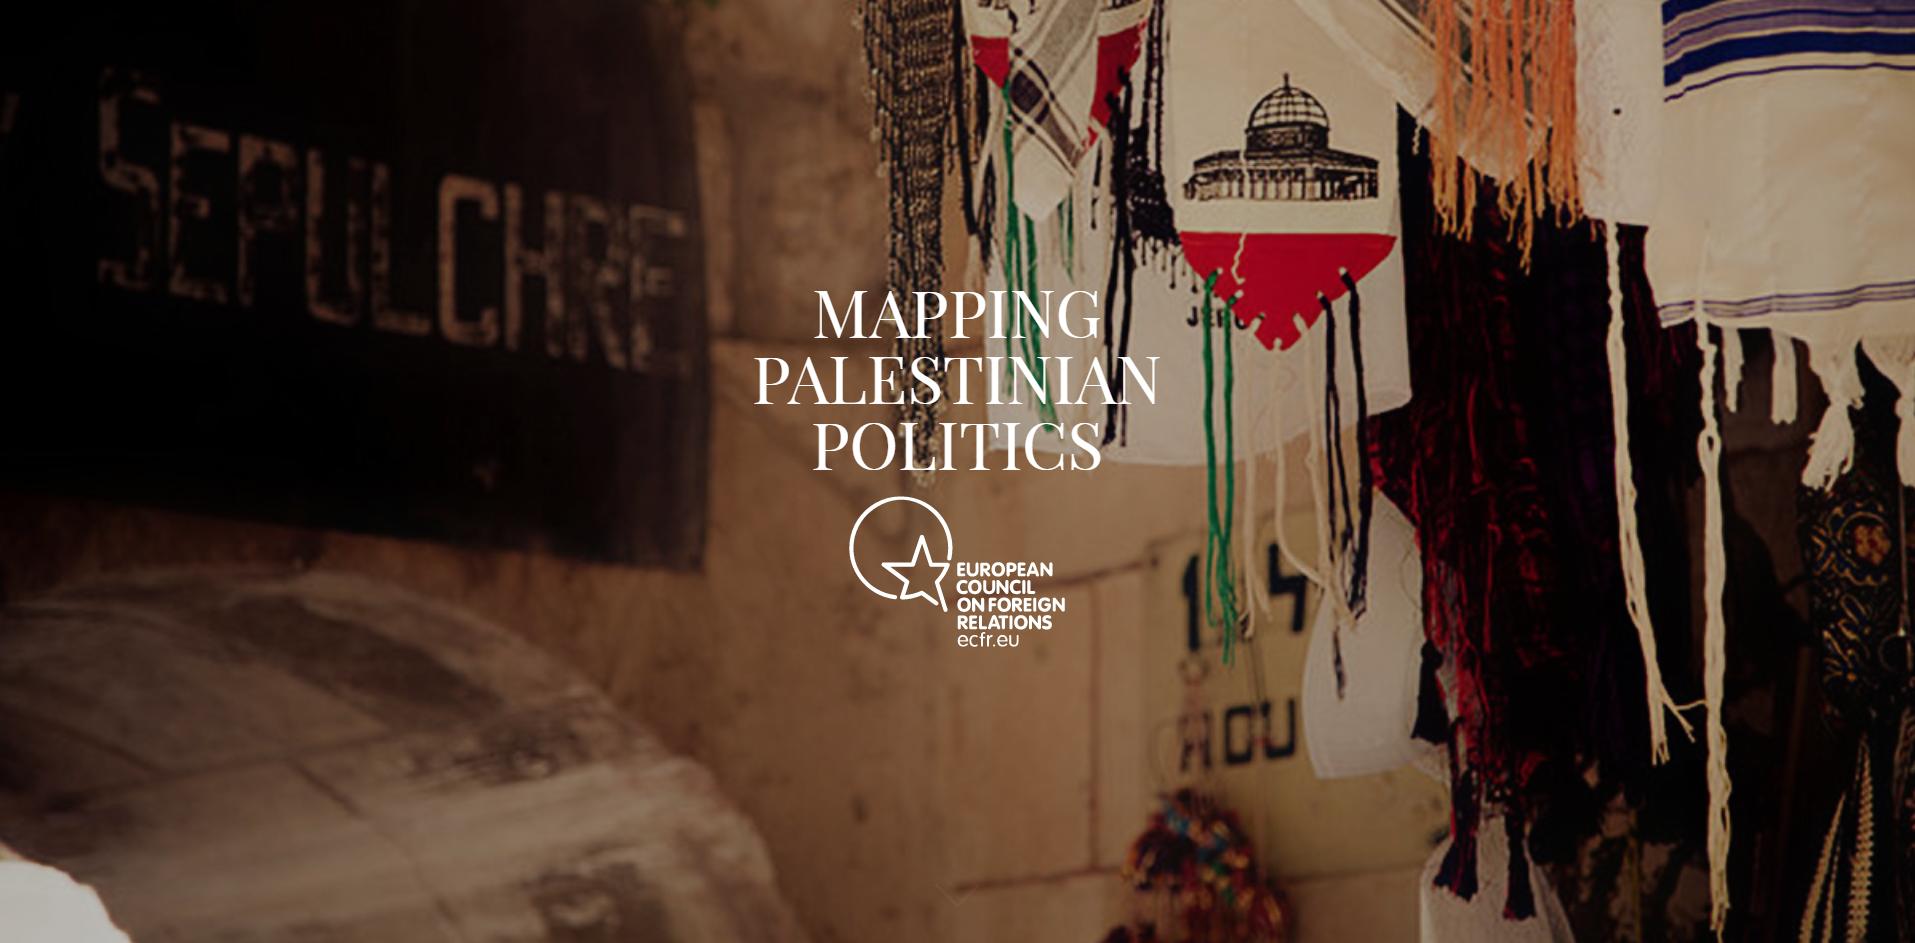 Proyecto web interactivo: 'Mapping Palestinian Politics'